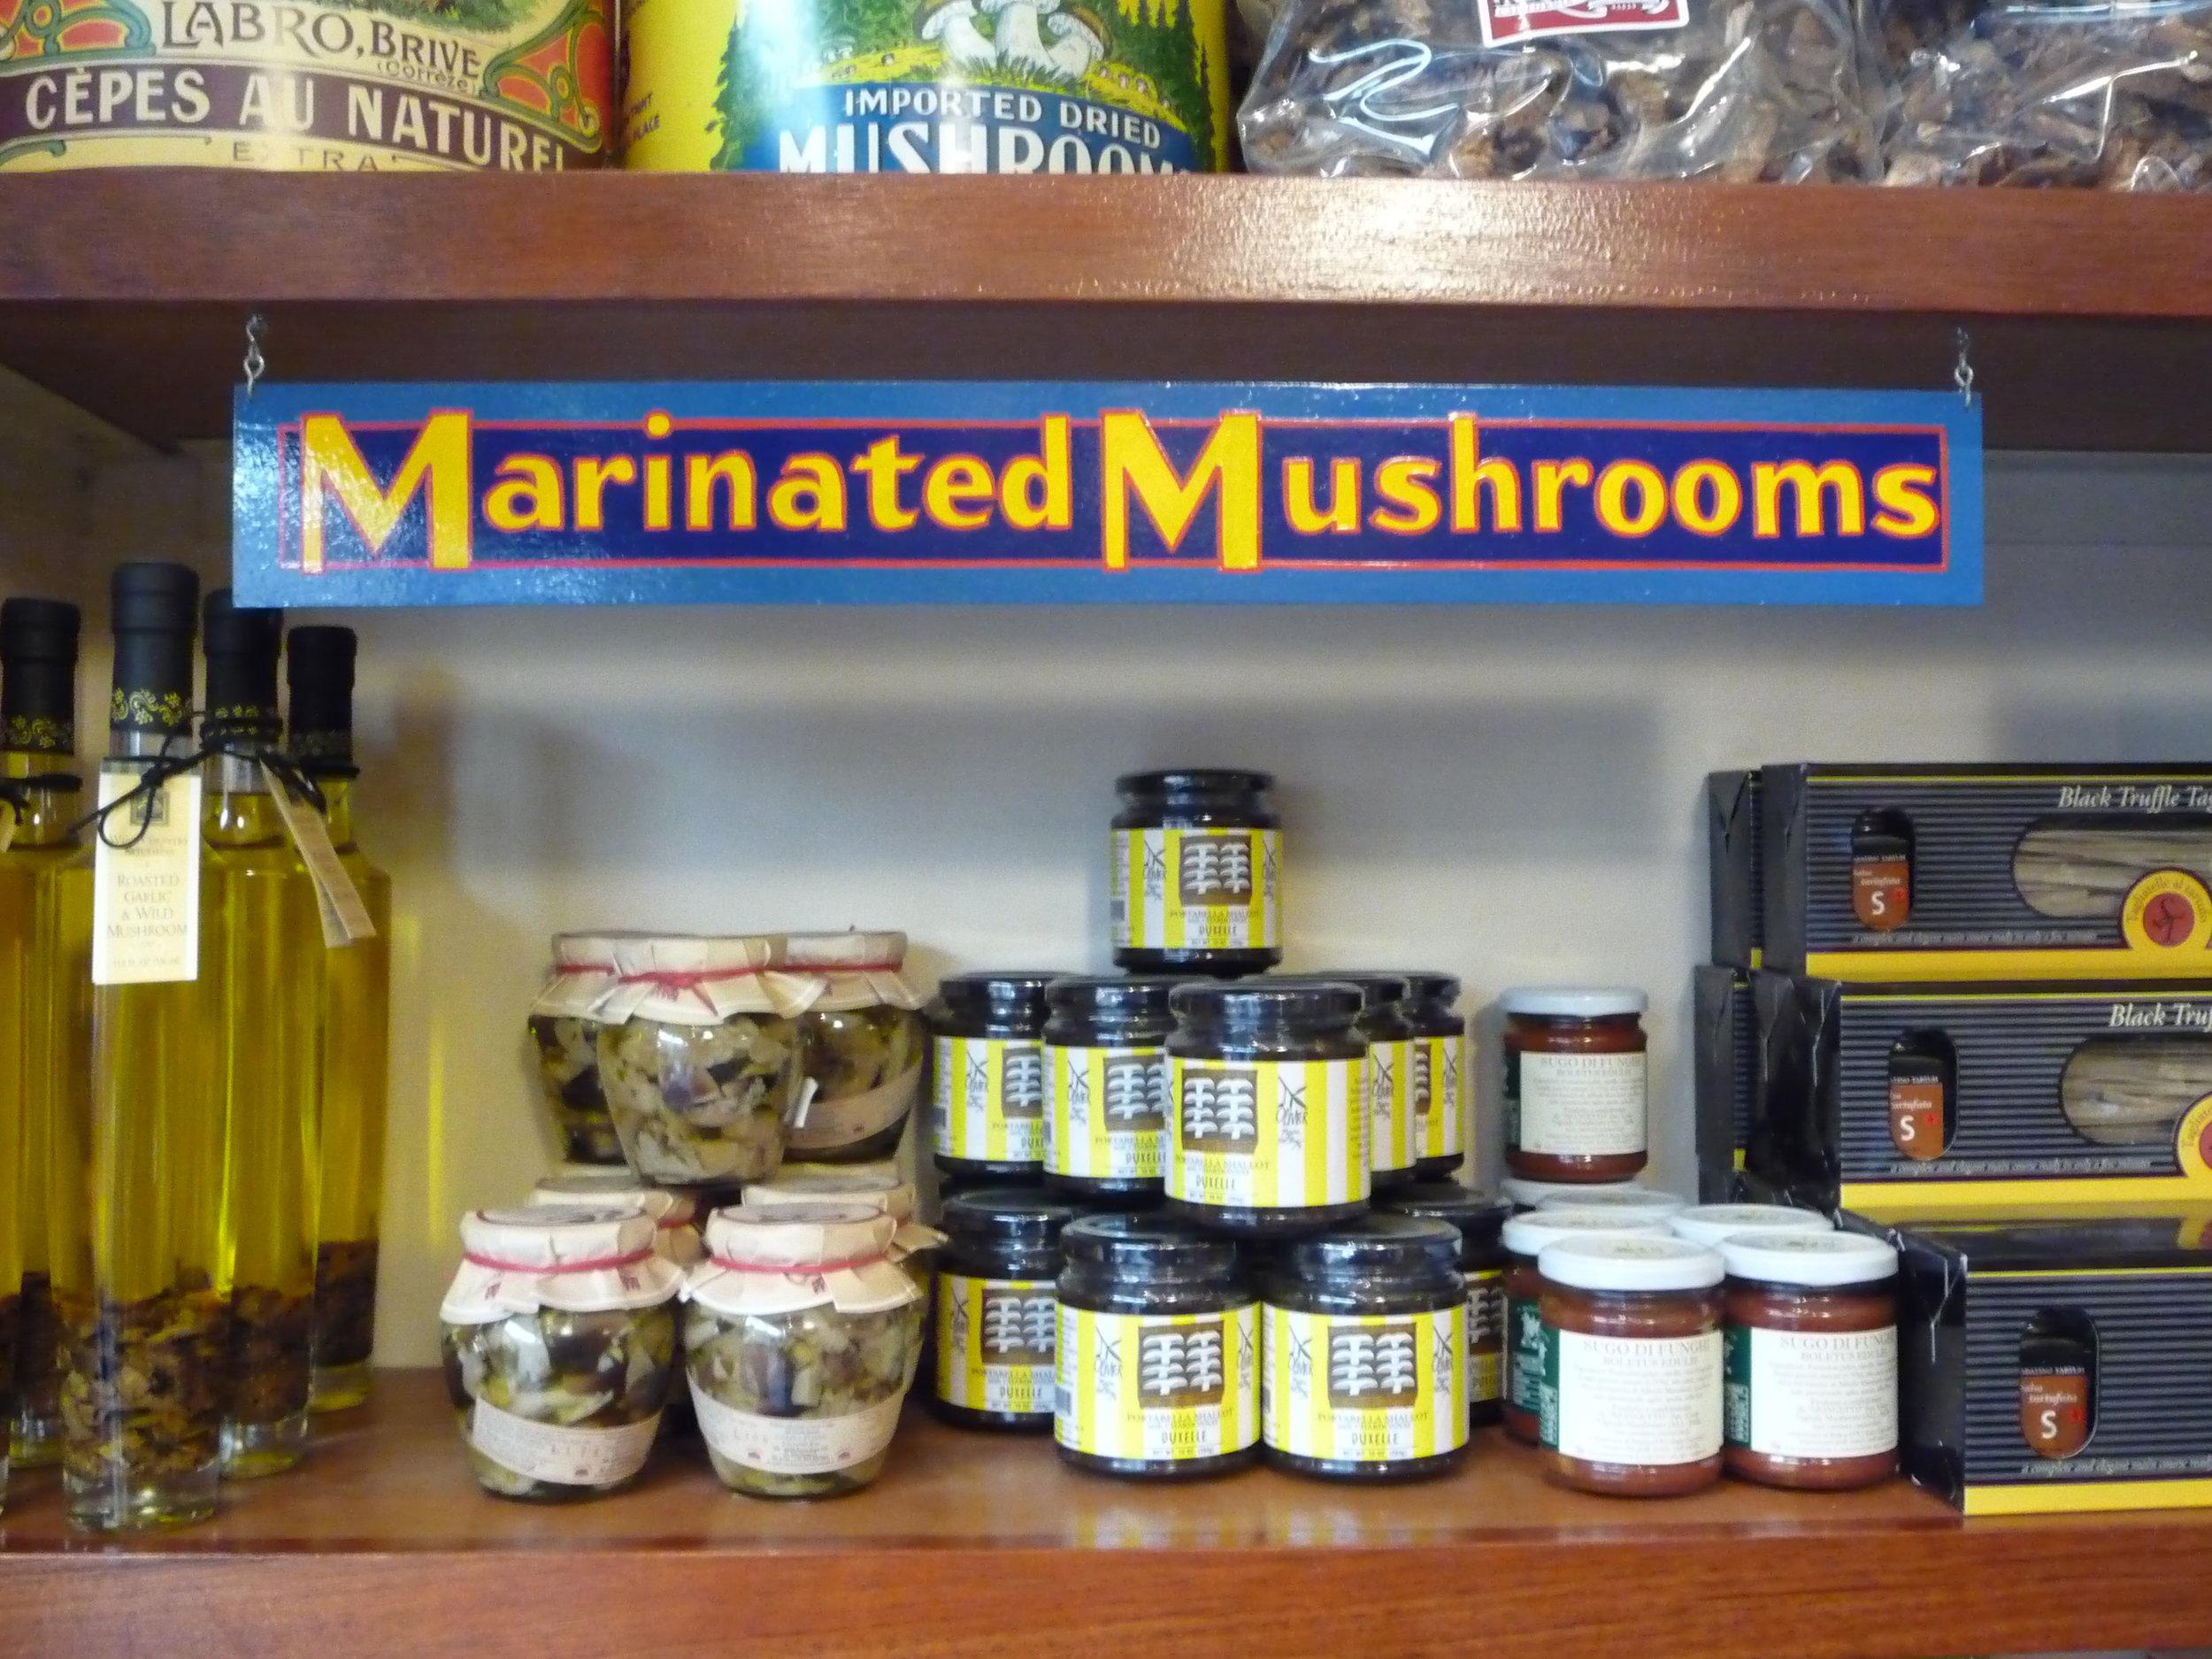 ORIG-far-west-fungi-marinated-mushrooms-shelf-sign_4323725446_o.jpg